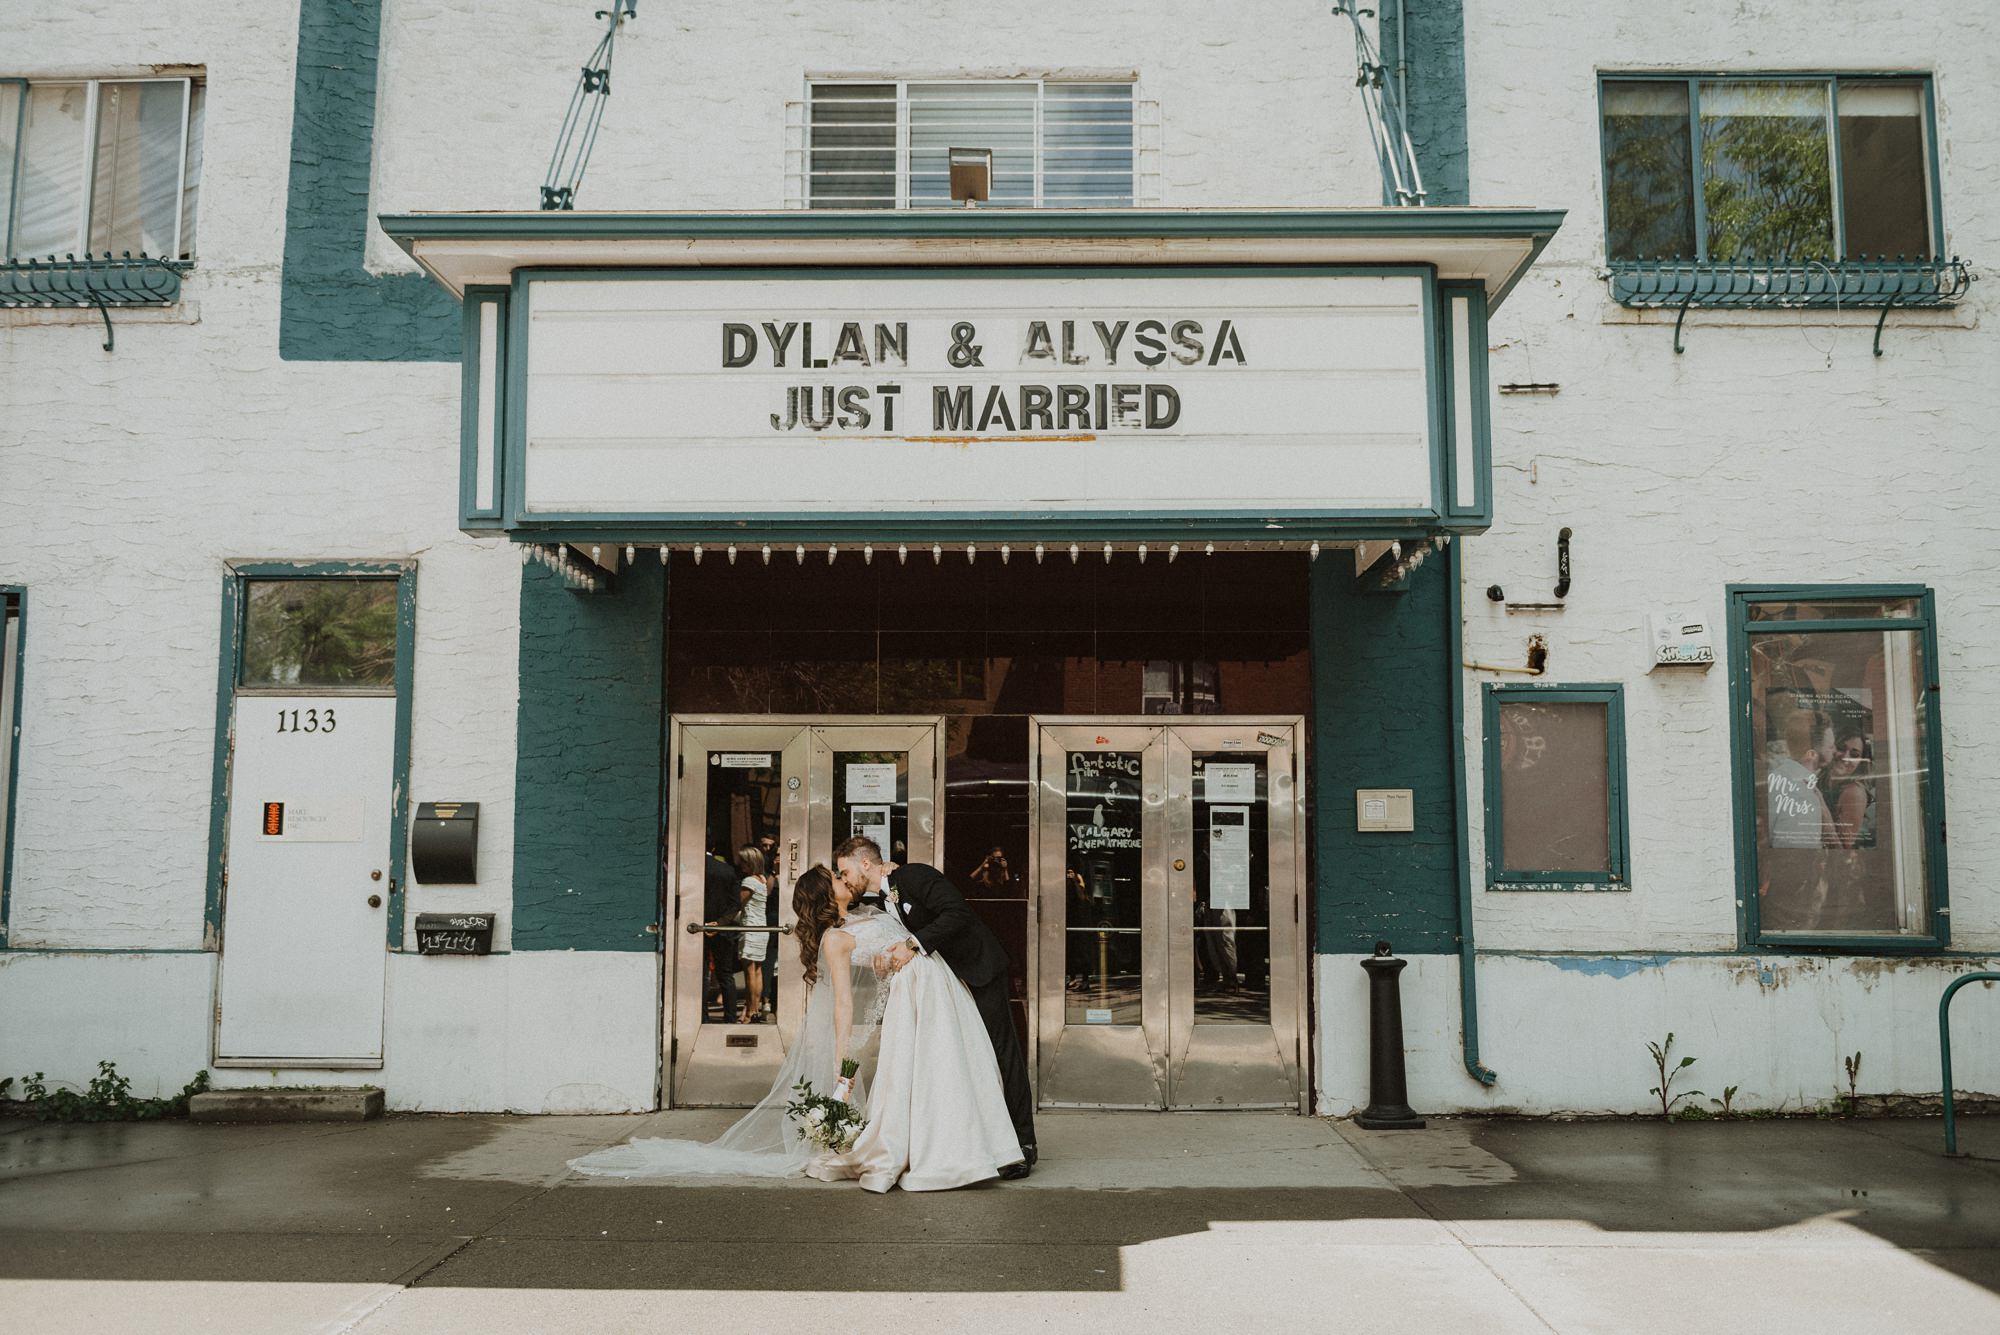 stylish bride and groom in plaza theatre wedding in kensington, calgary